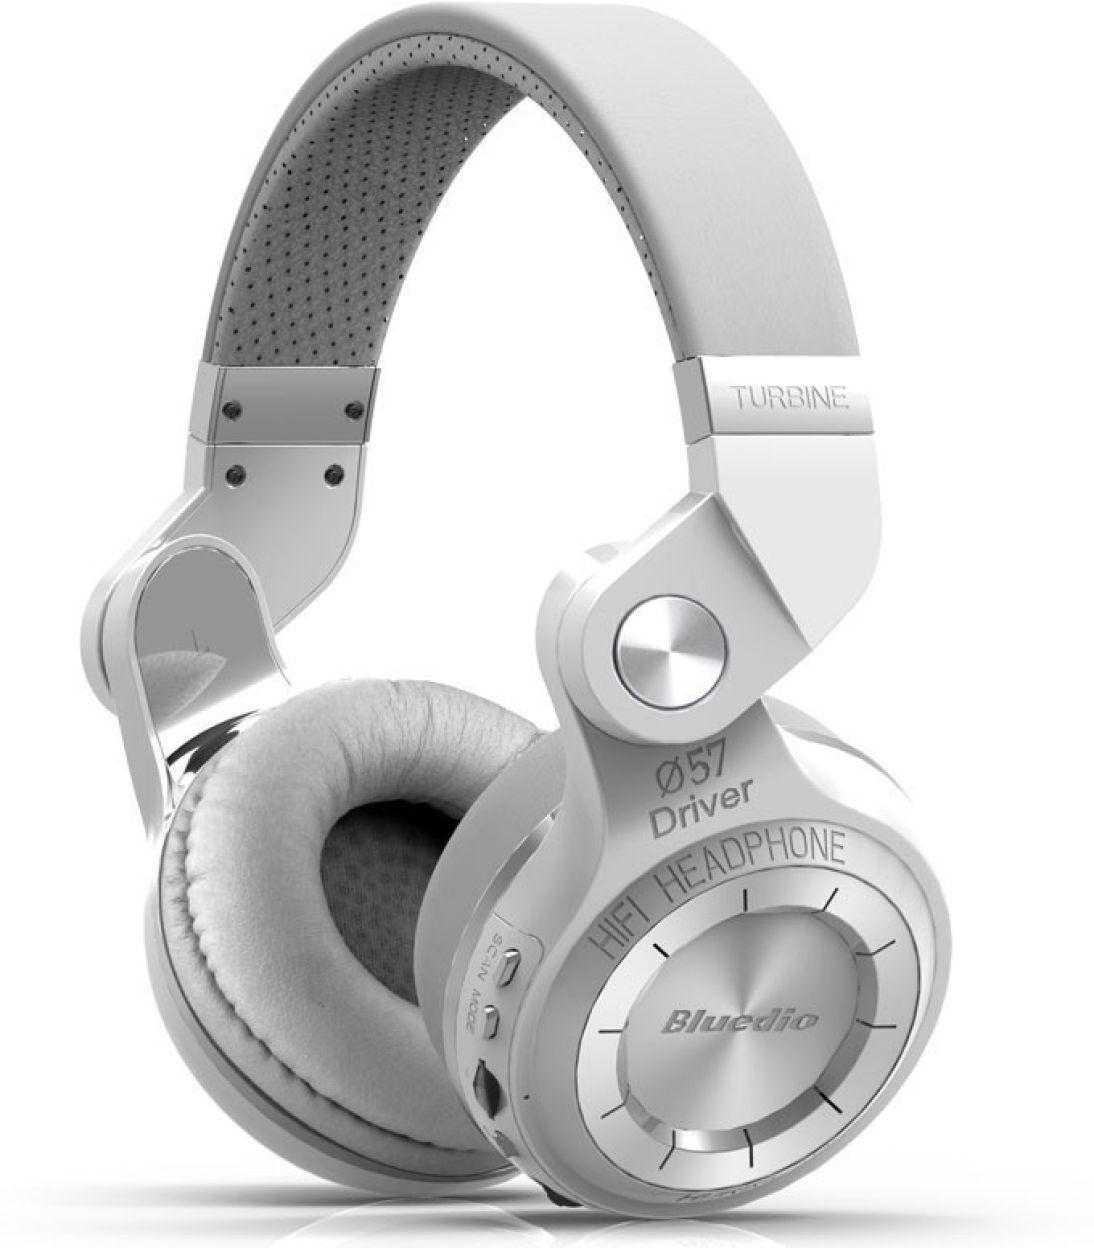 Topprice In Price Comparison In India Bluetooth Headphones Wireless Wireless Headphones Stereo Headphones